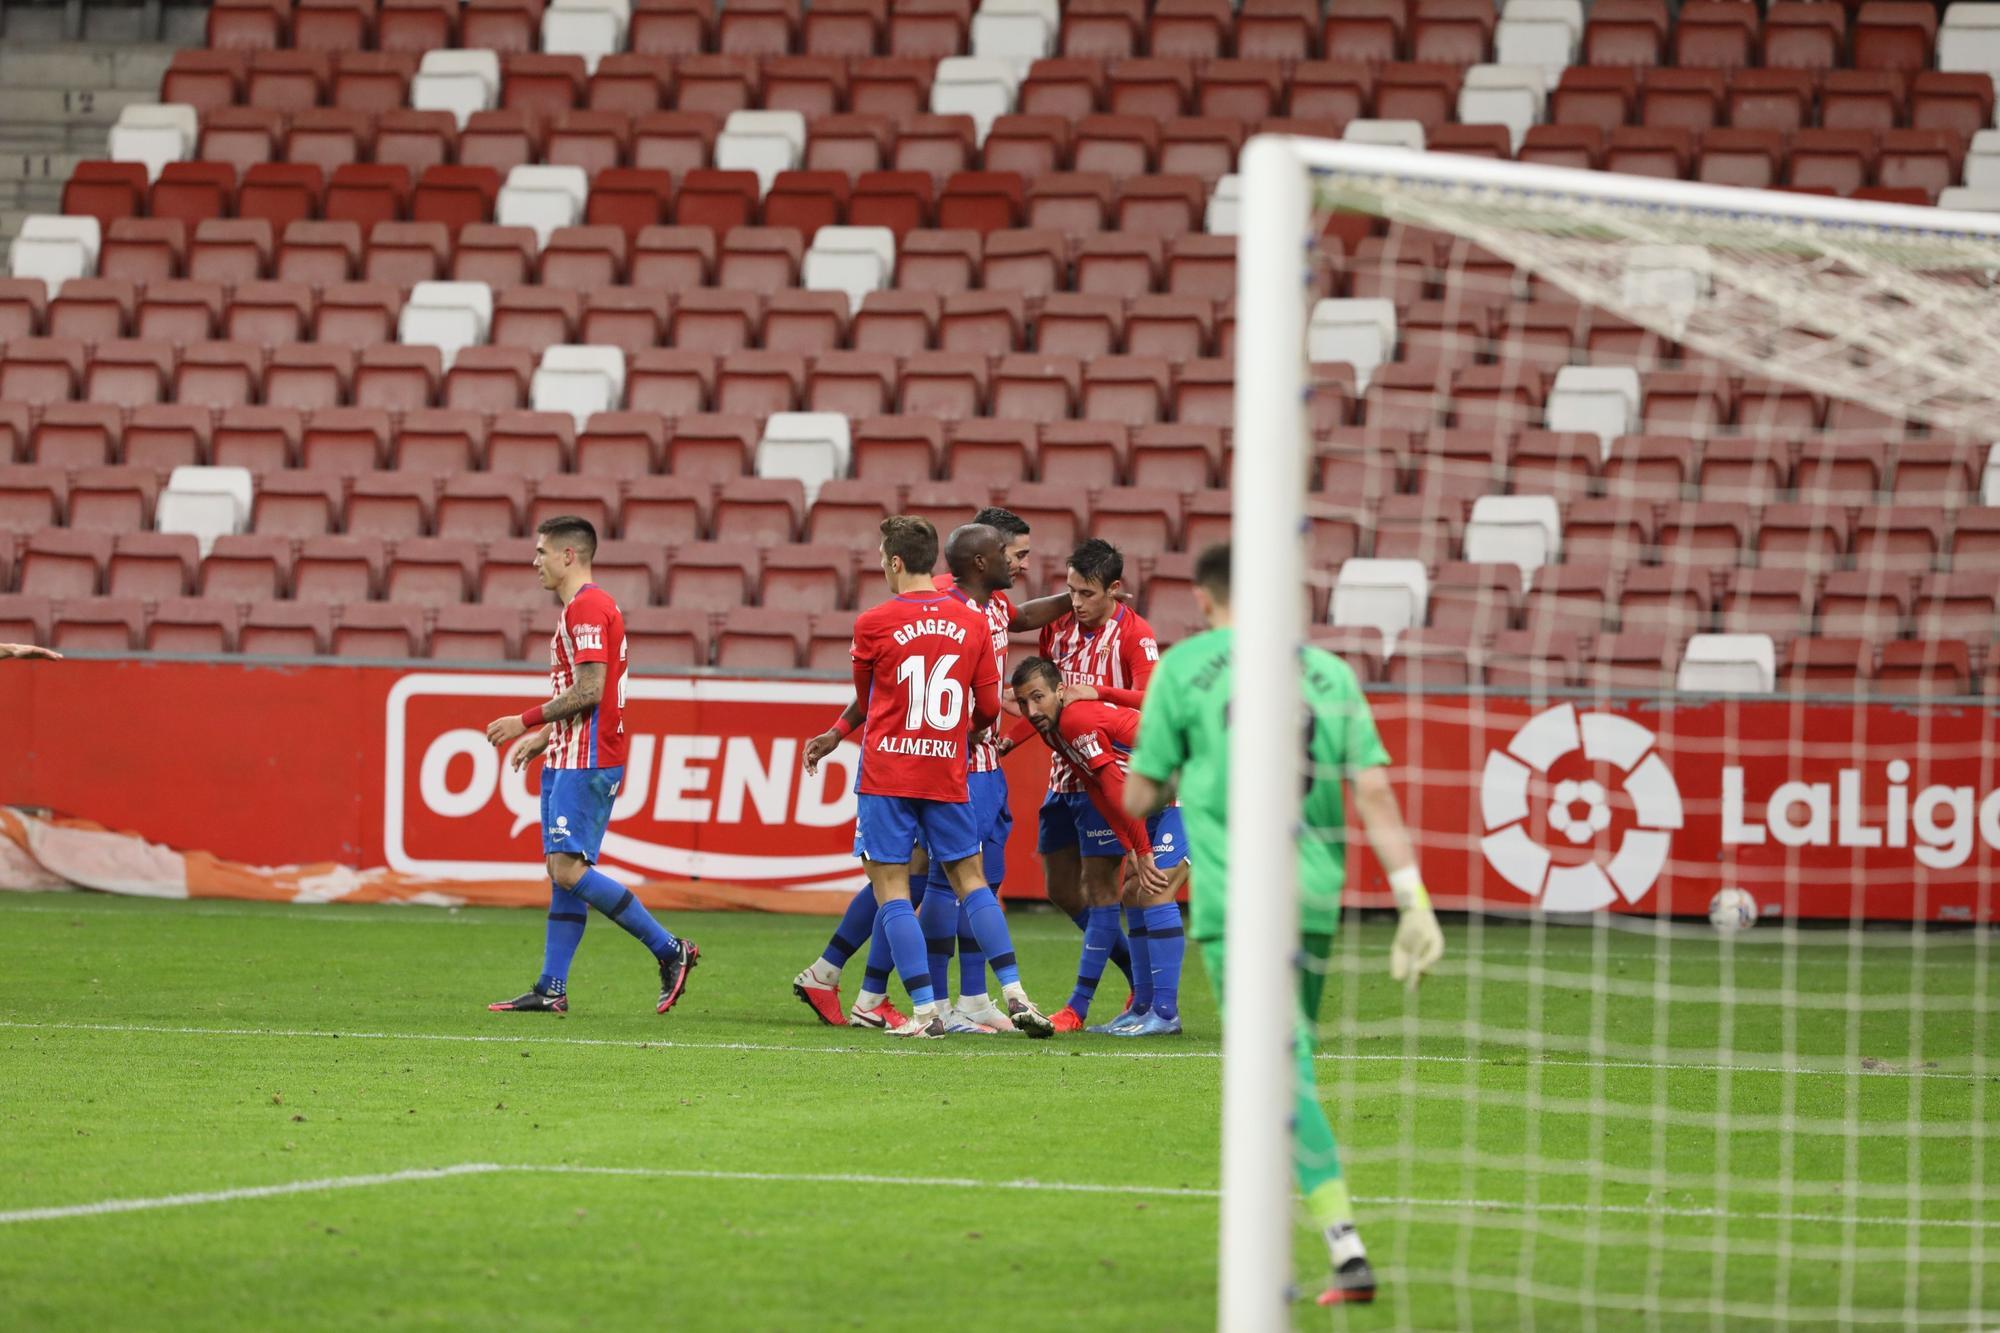 Sporting 1 - 1 Rayo Vallecano